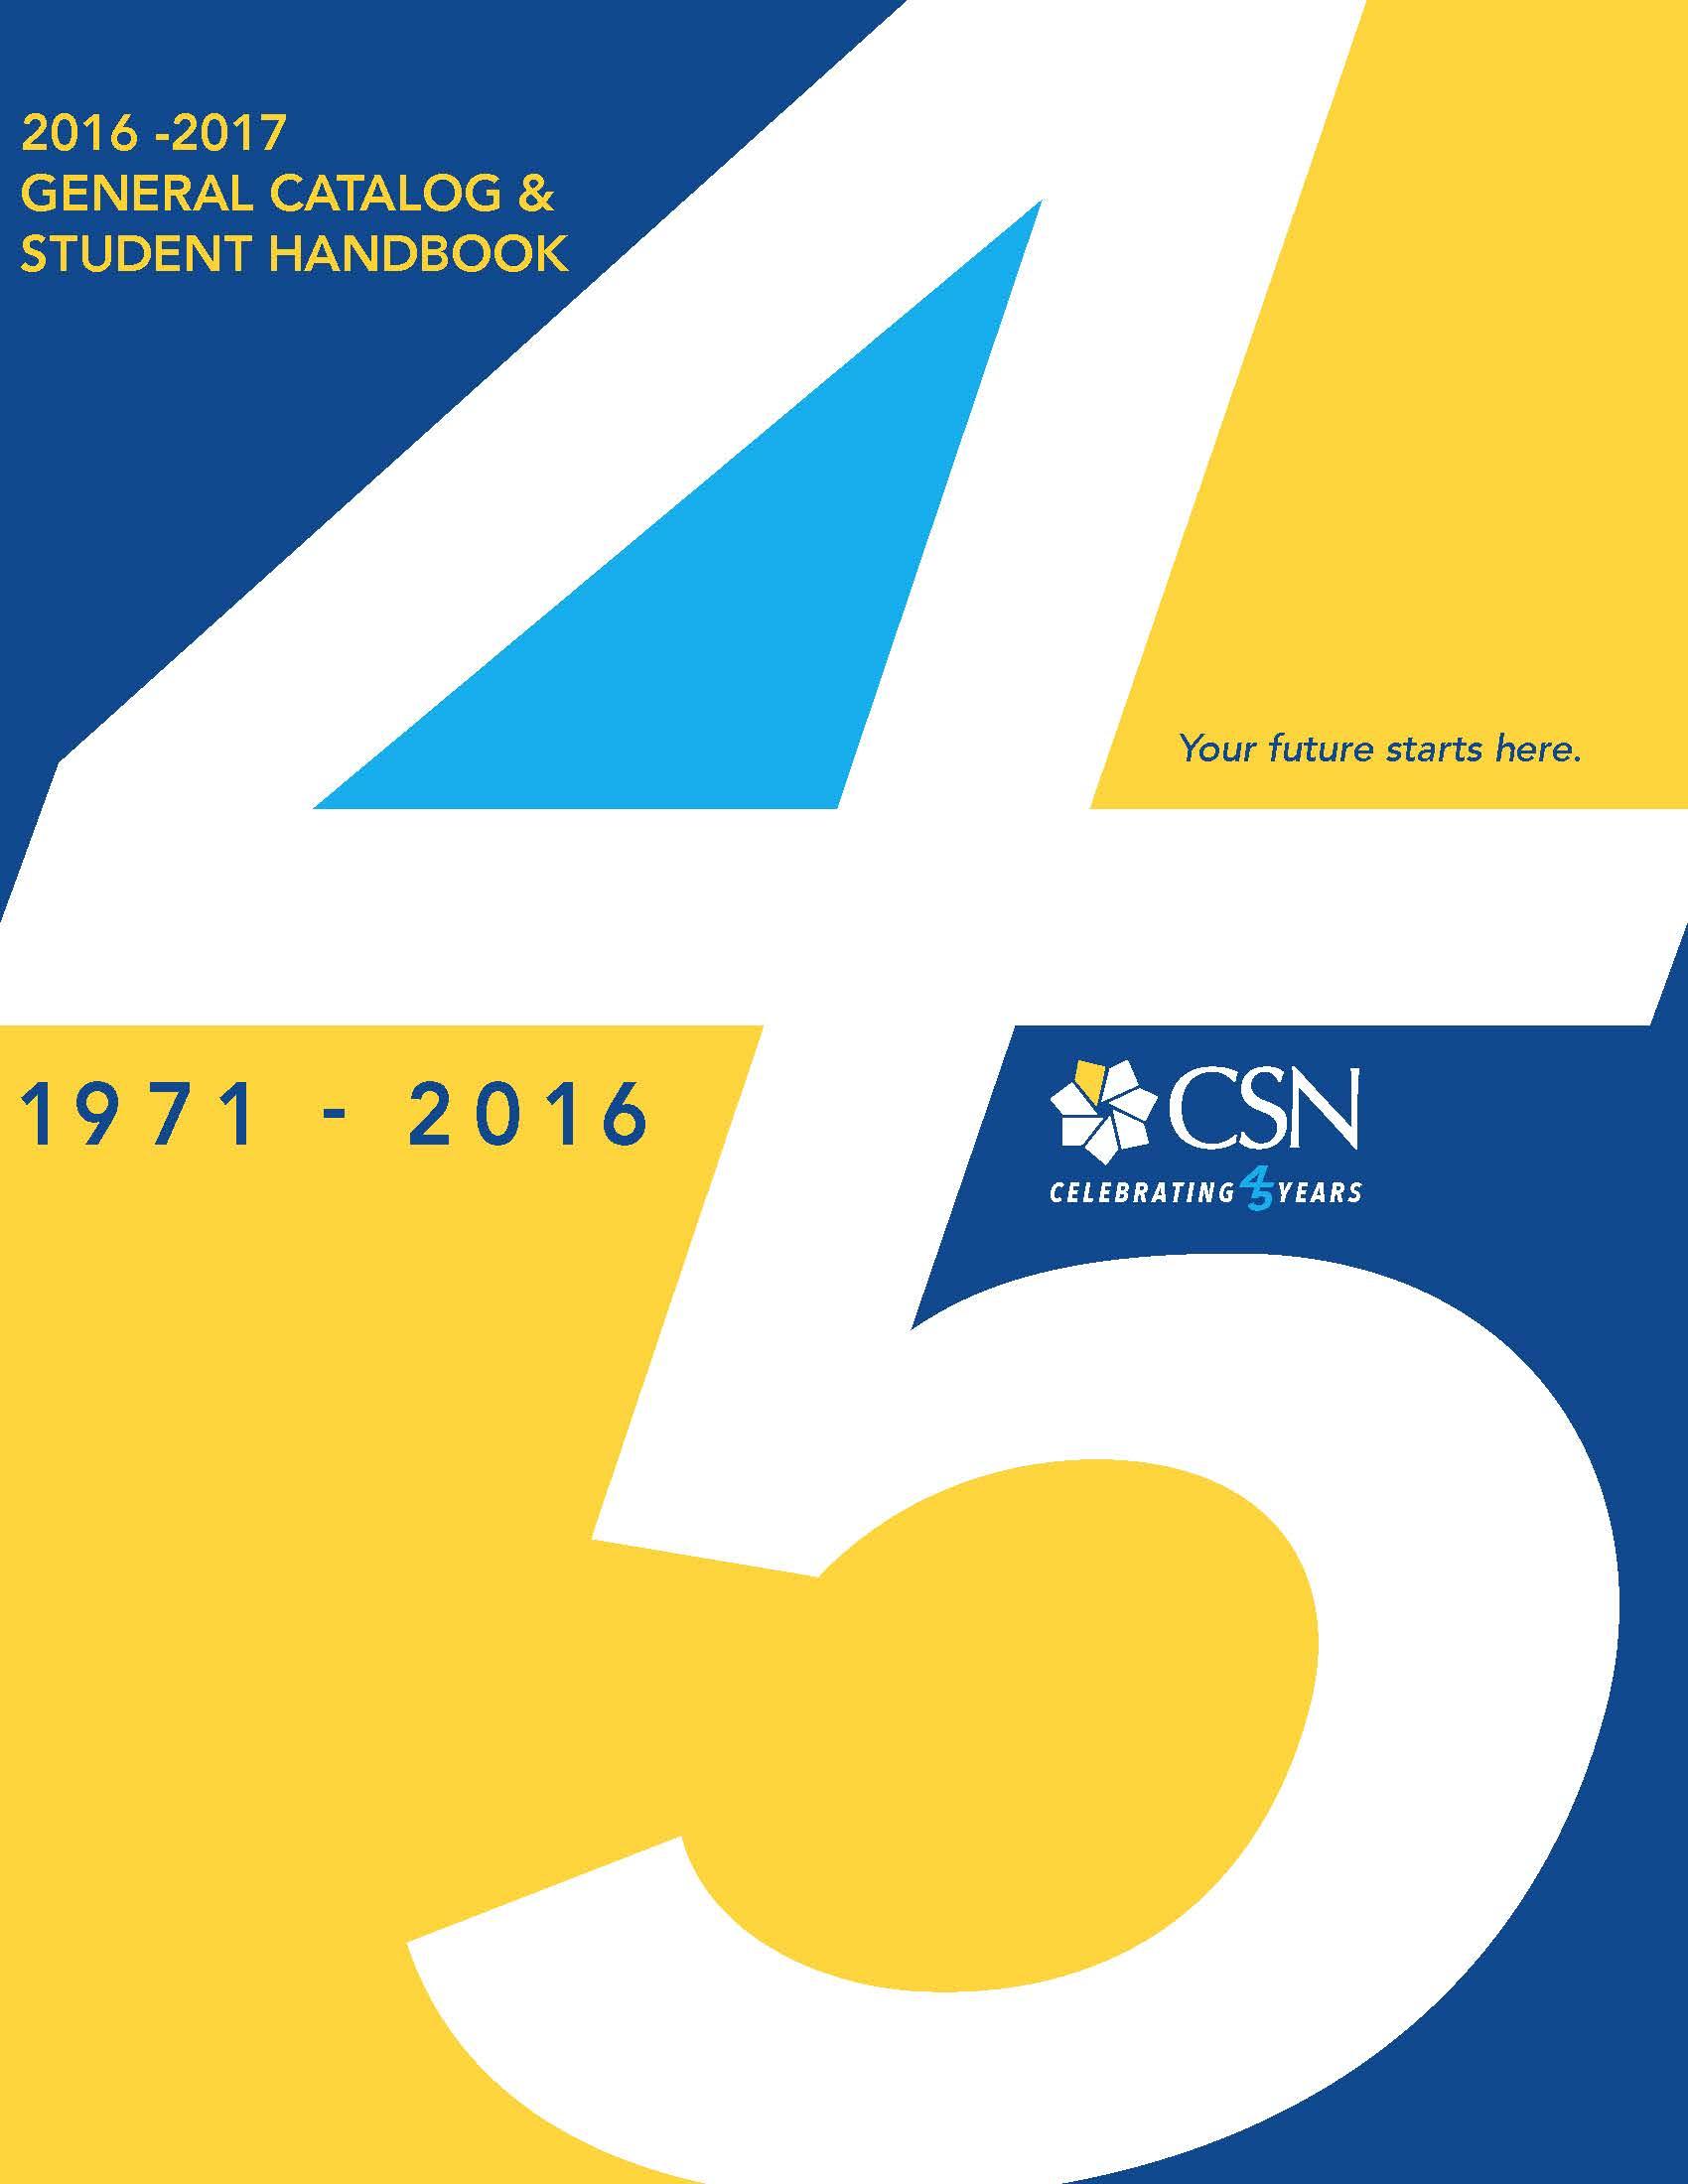 2016-2017 General Catalog and Student Handbook